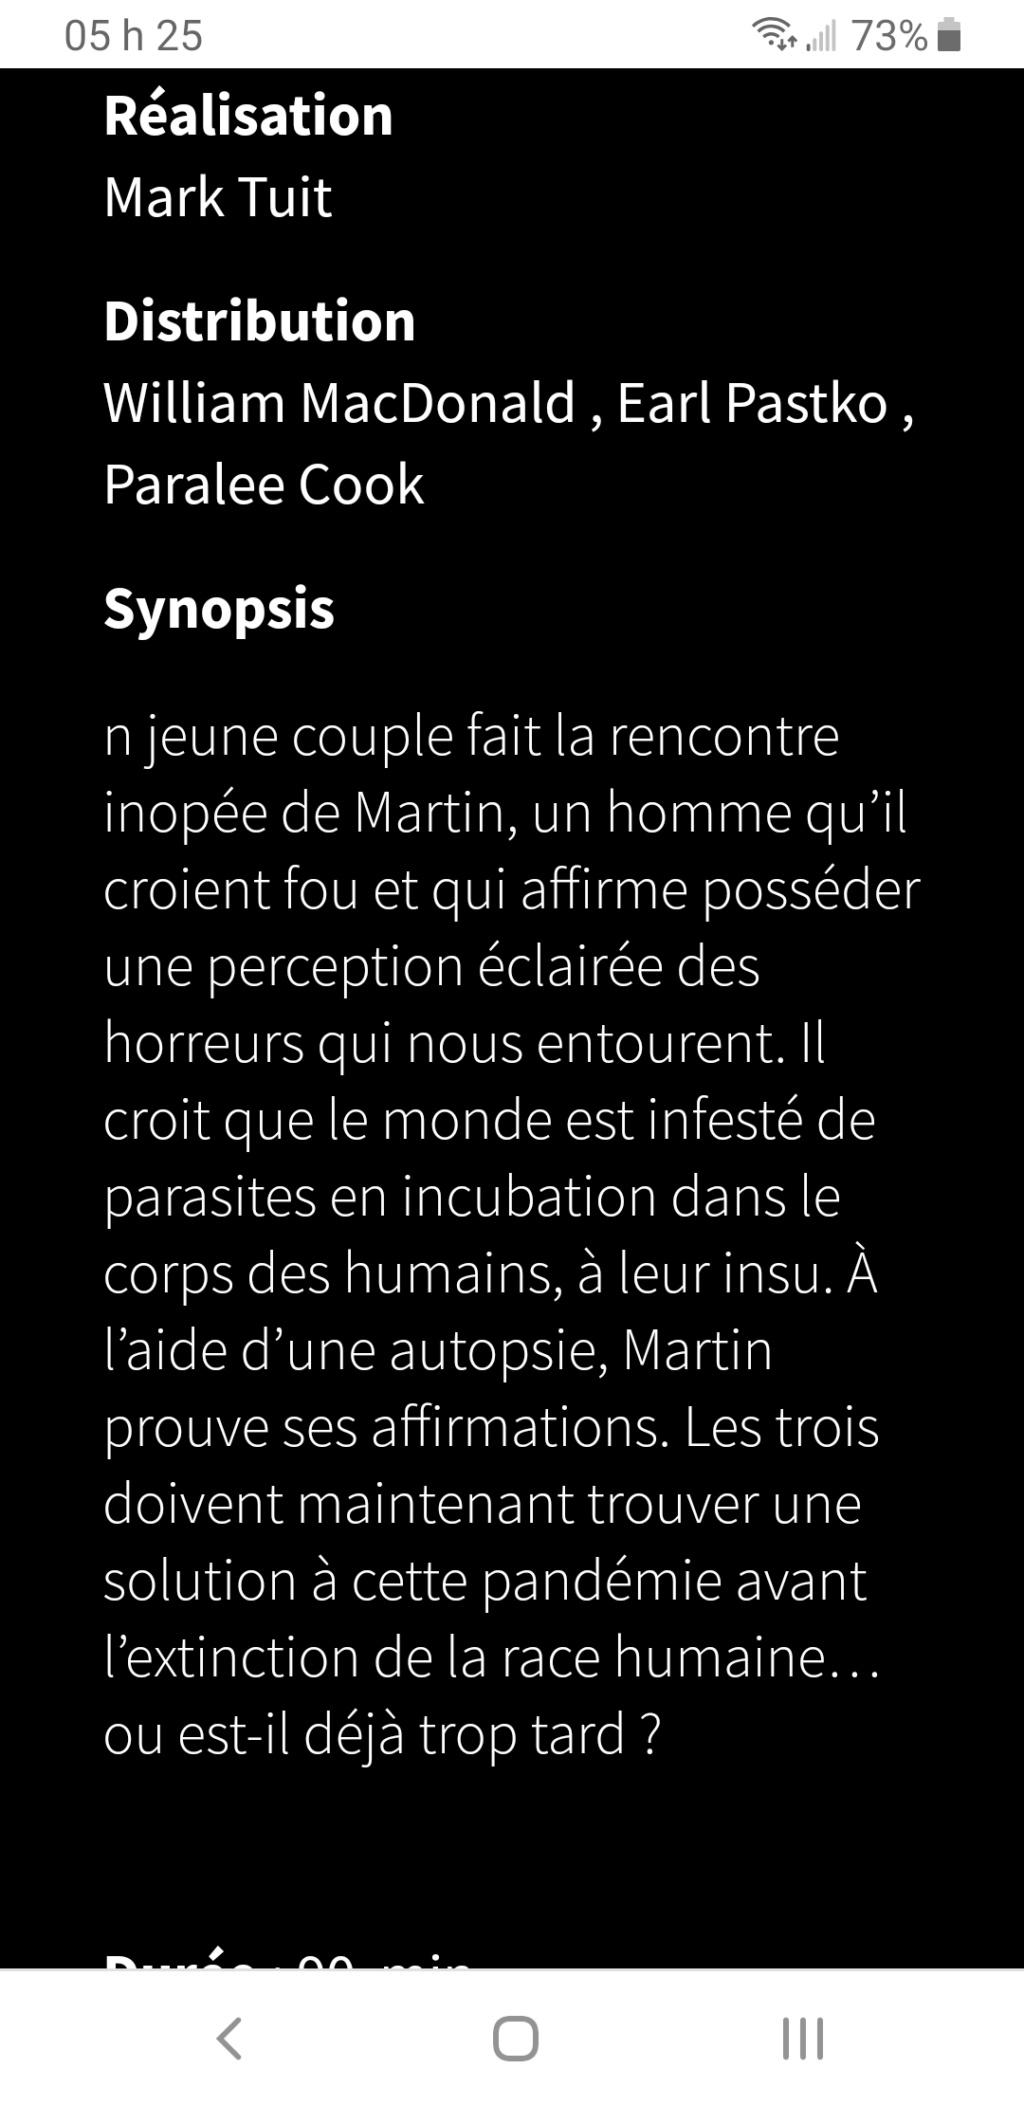 Sous-humain (Subhuman) Qui fait la voix de Martin? Screen10